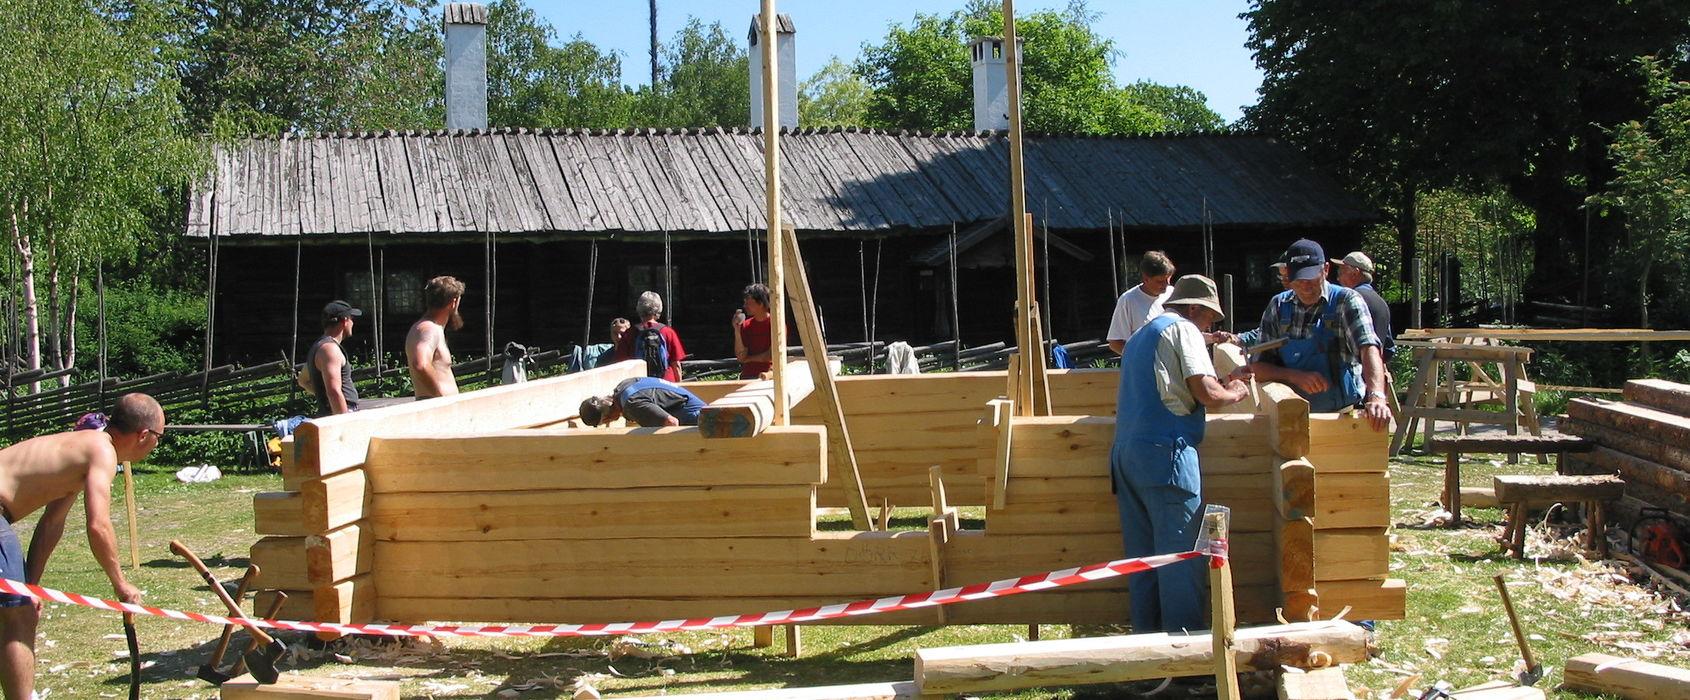 Kurs i byggnadsvård